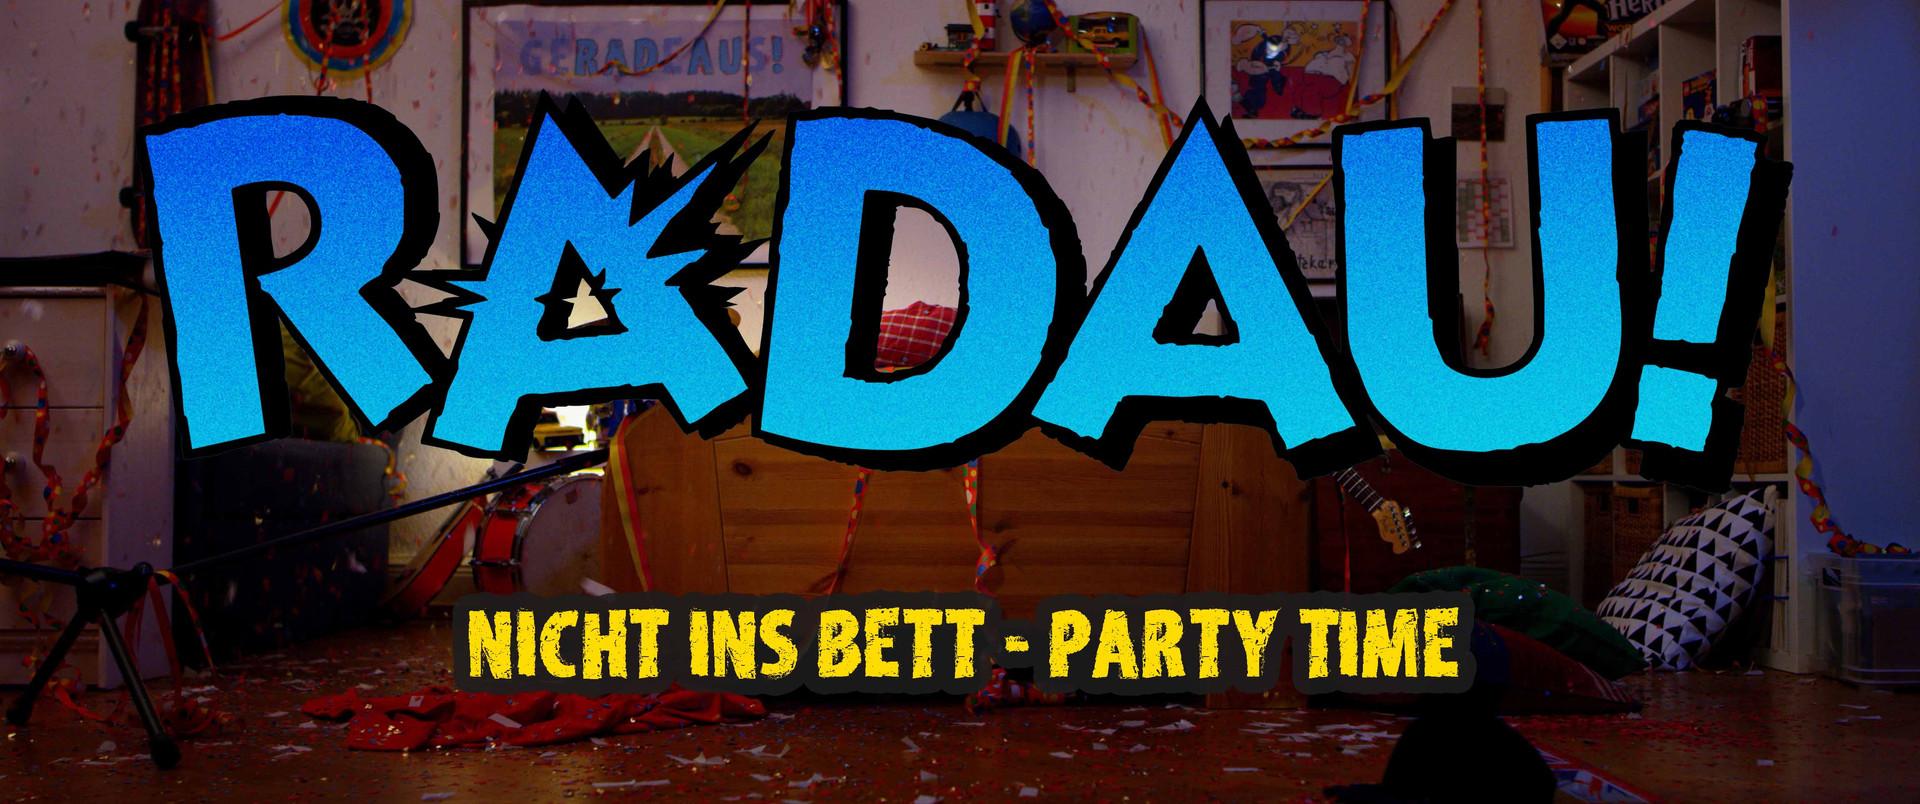 radau partytime party time scholz schol2ens die scholzens diescholzens montyscholz robinscholz